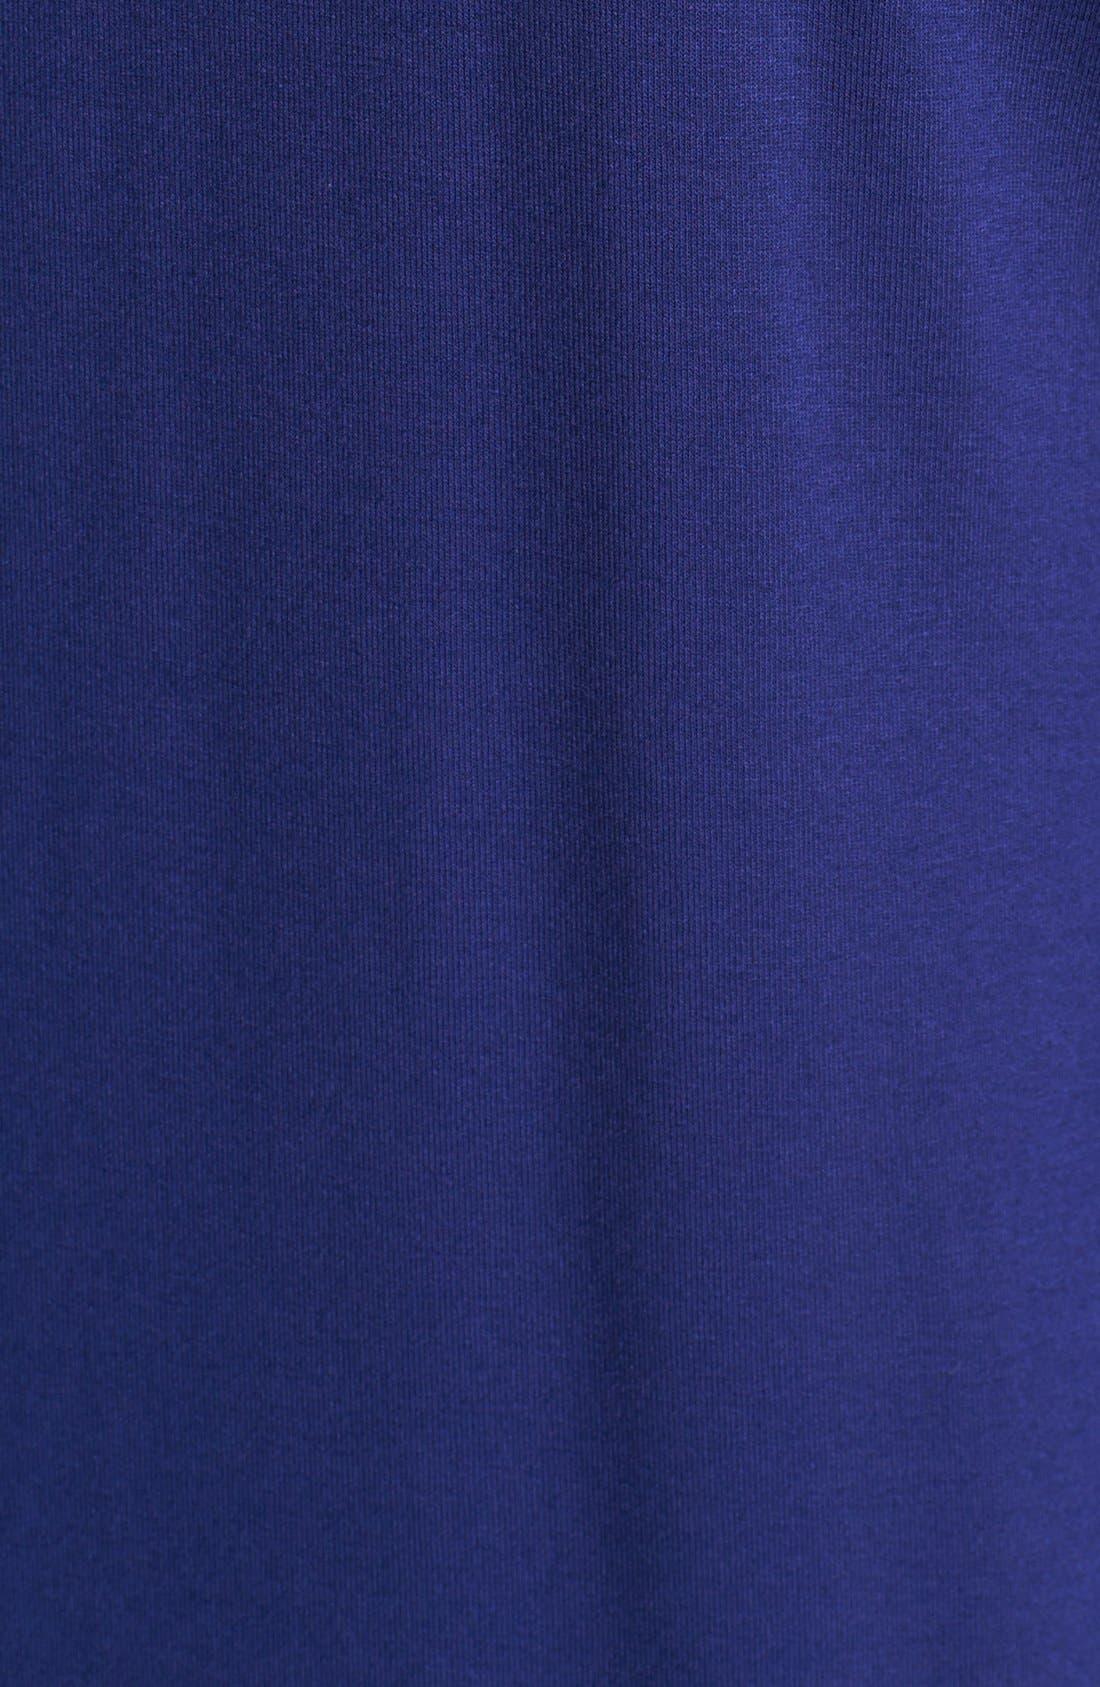 Alternate Image 3  - Evans Pintucked Jersey Shirt (Plus Size)